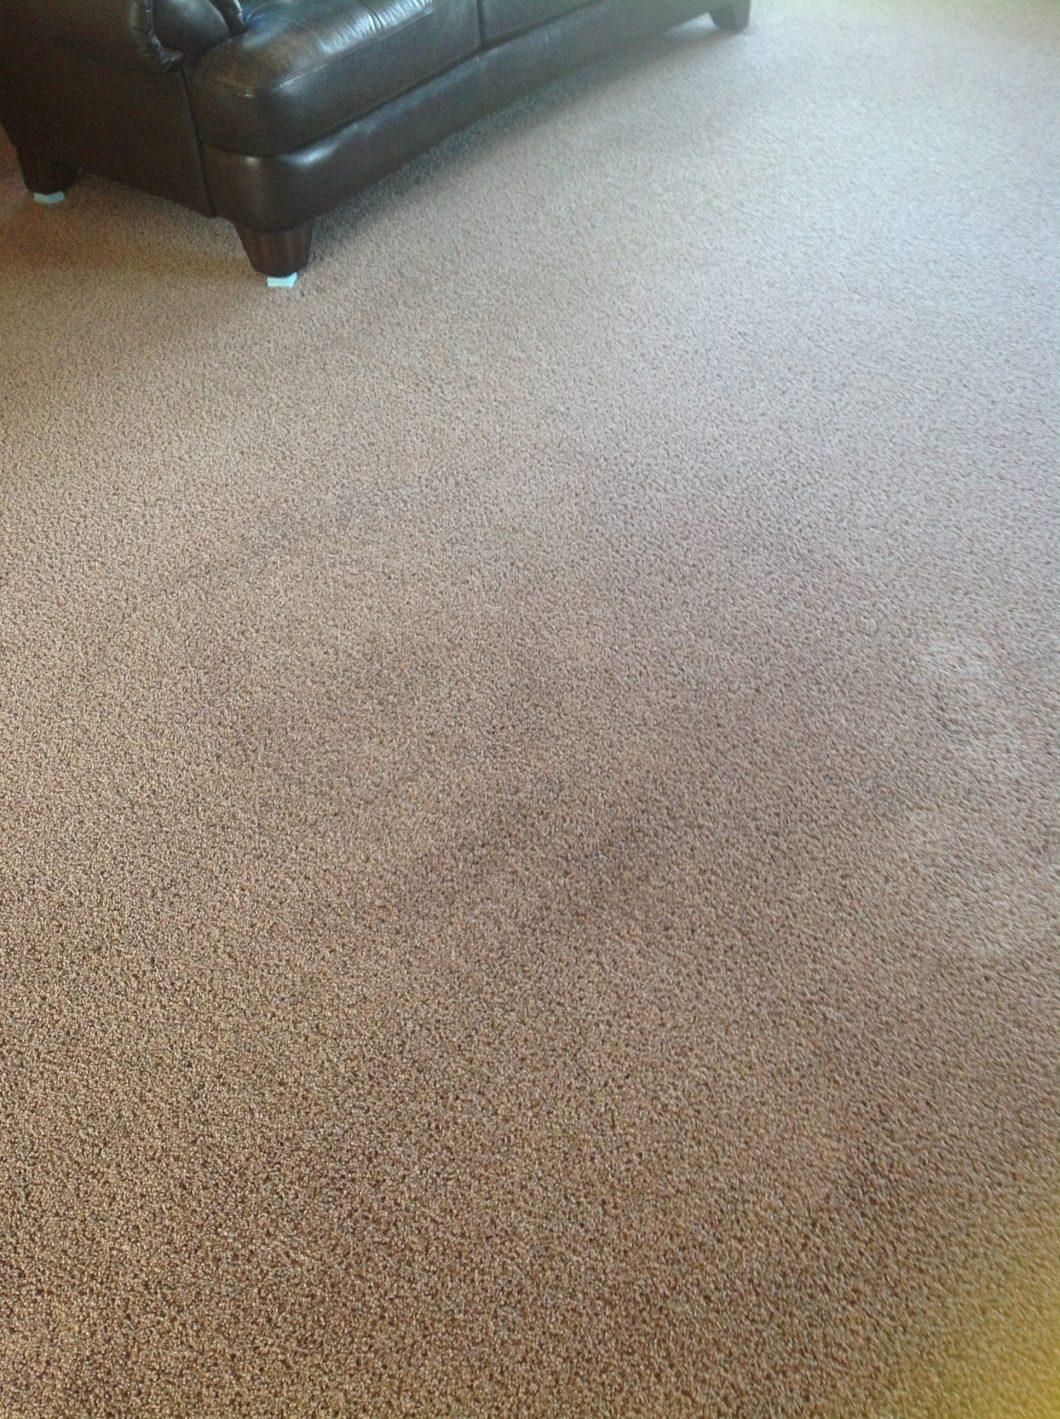 Mohawk Carpet Warranty Complaints Www Resnooze Com